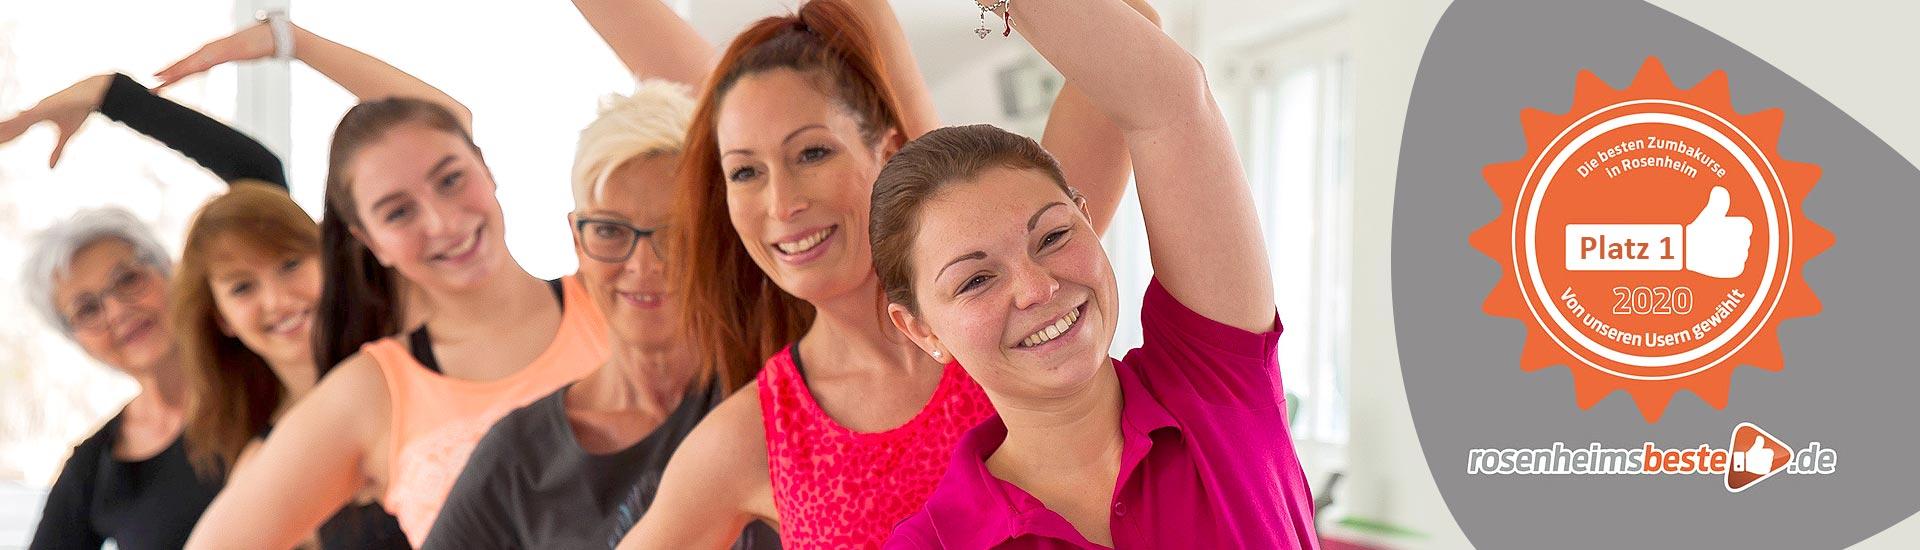 Abnehmen - Kurse und Training - Fitnessstudio Rosenheim Bad Aibling